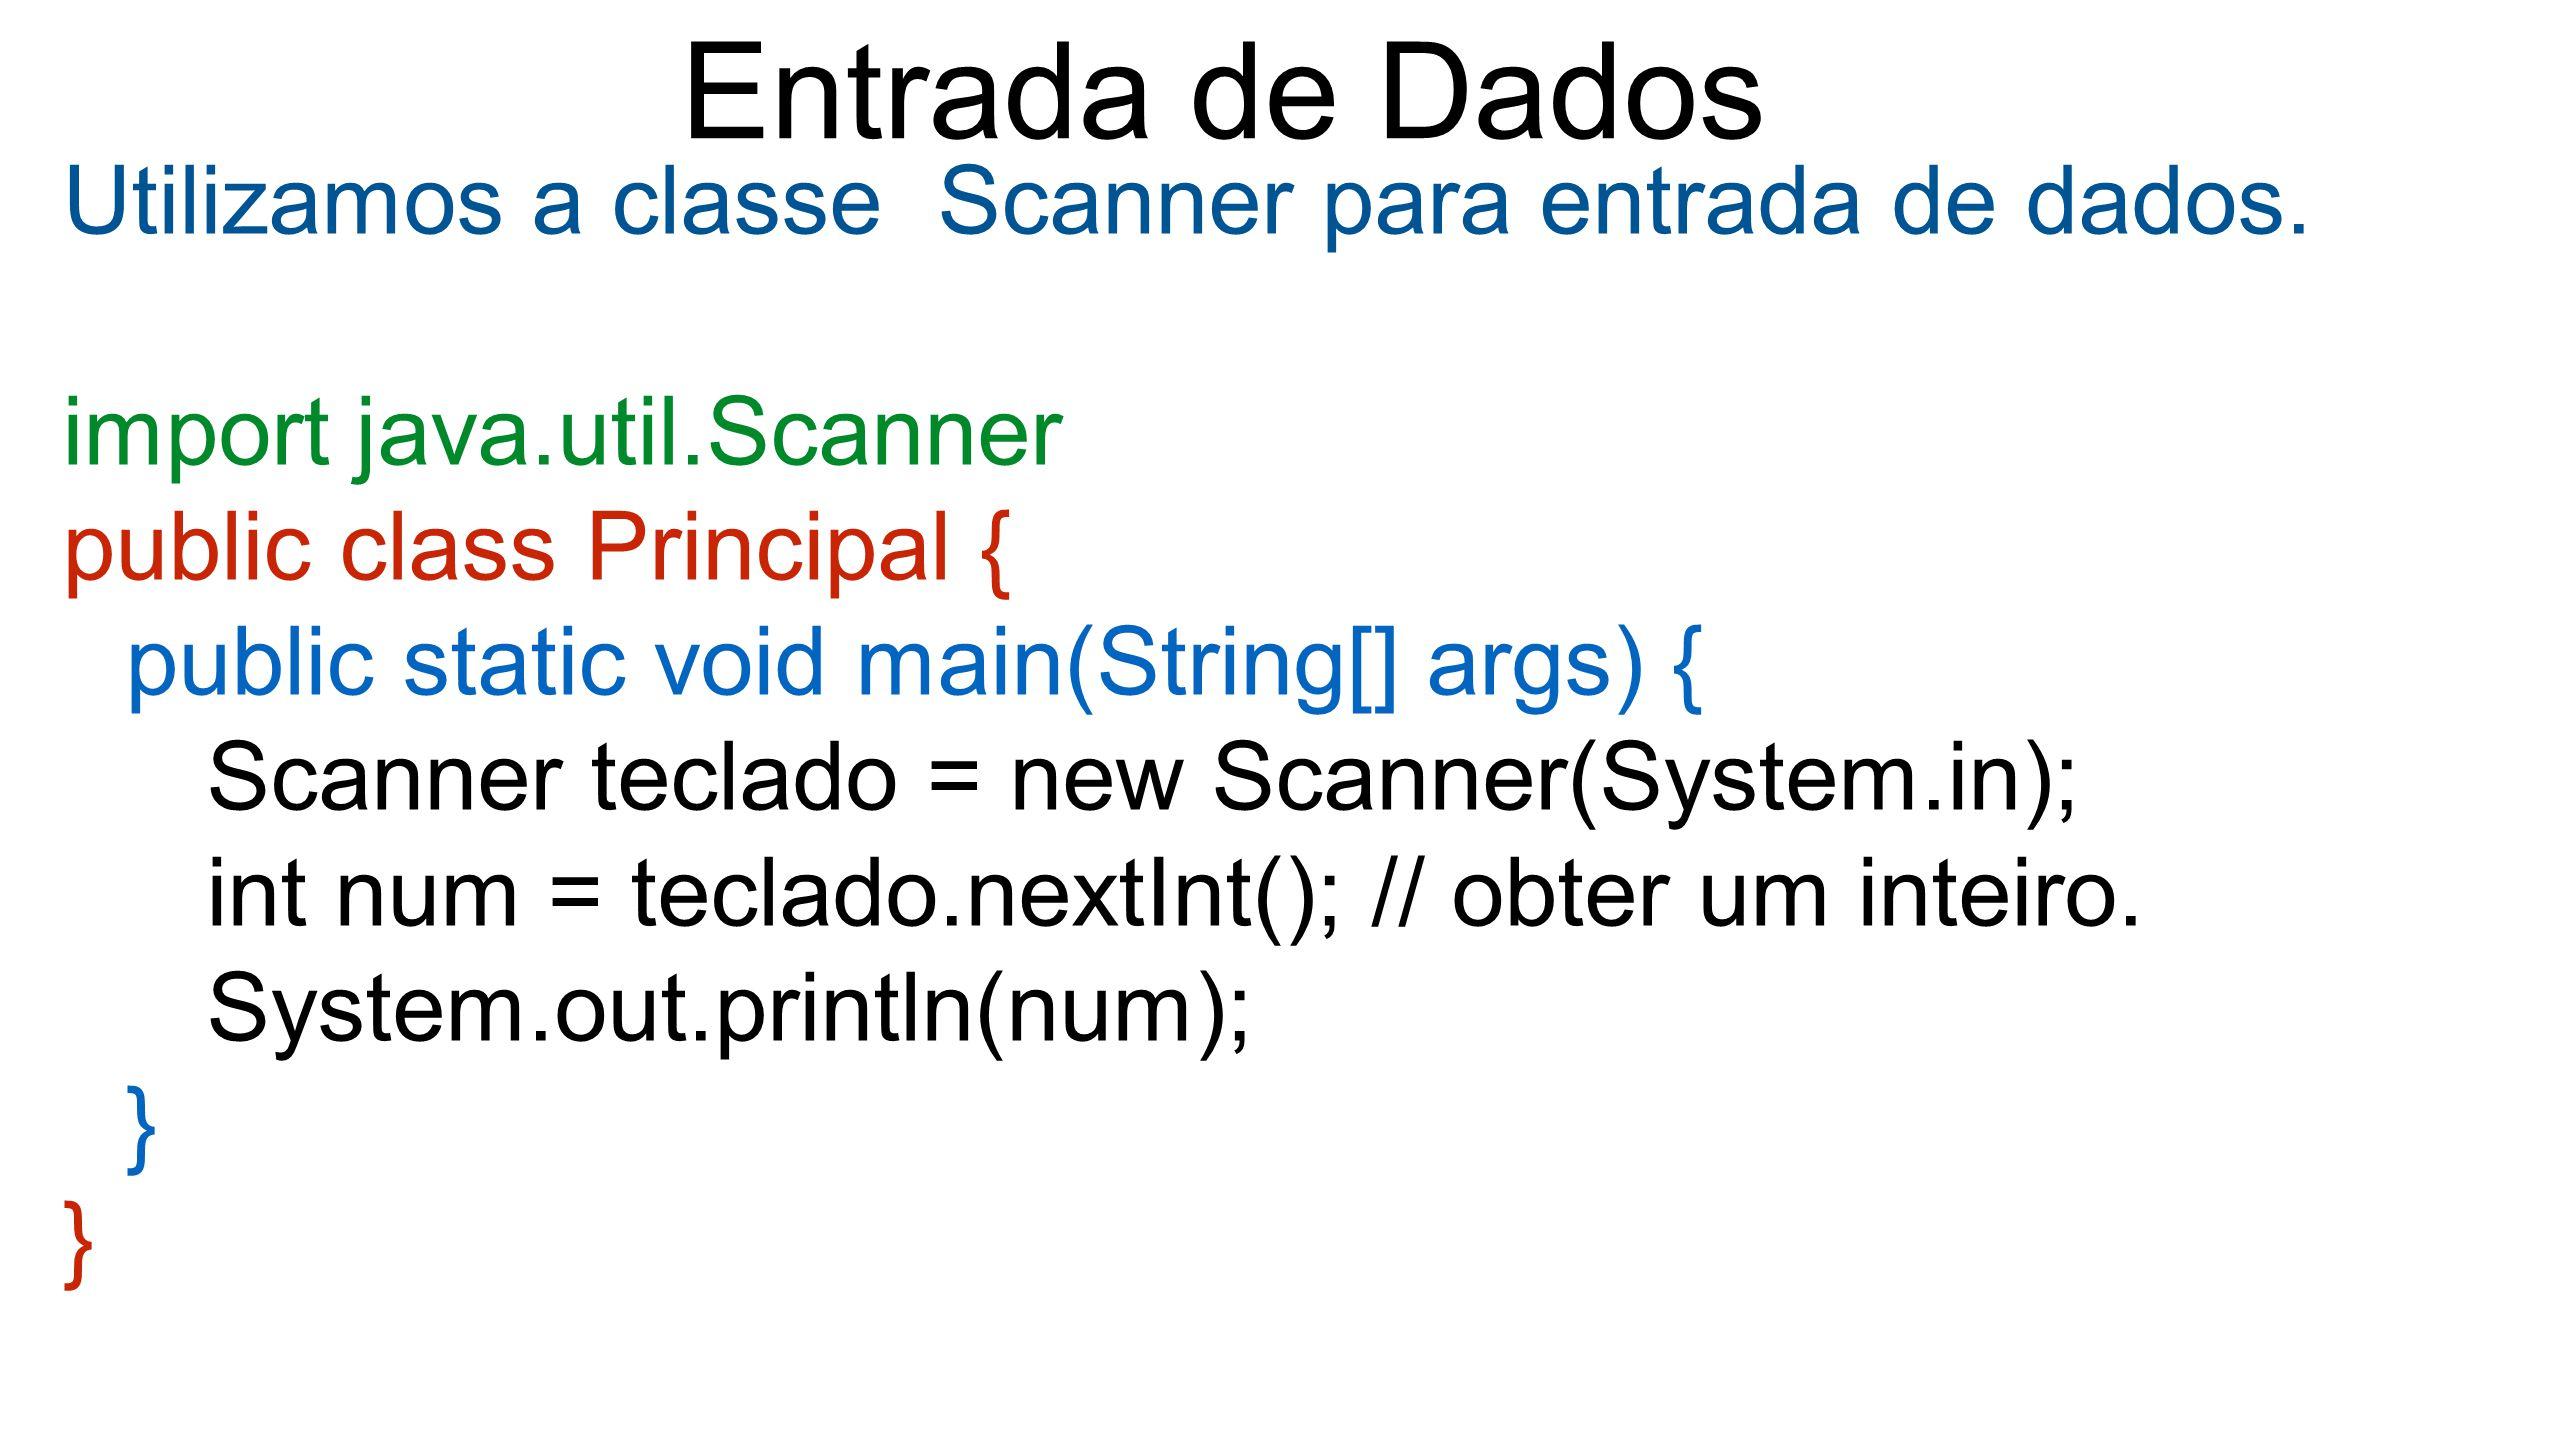 Entrada de Dados Utilizamos a classe Scanner para entrada de dados. import java.util.Scanner public class Principal { public static void main(String[]